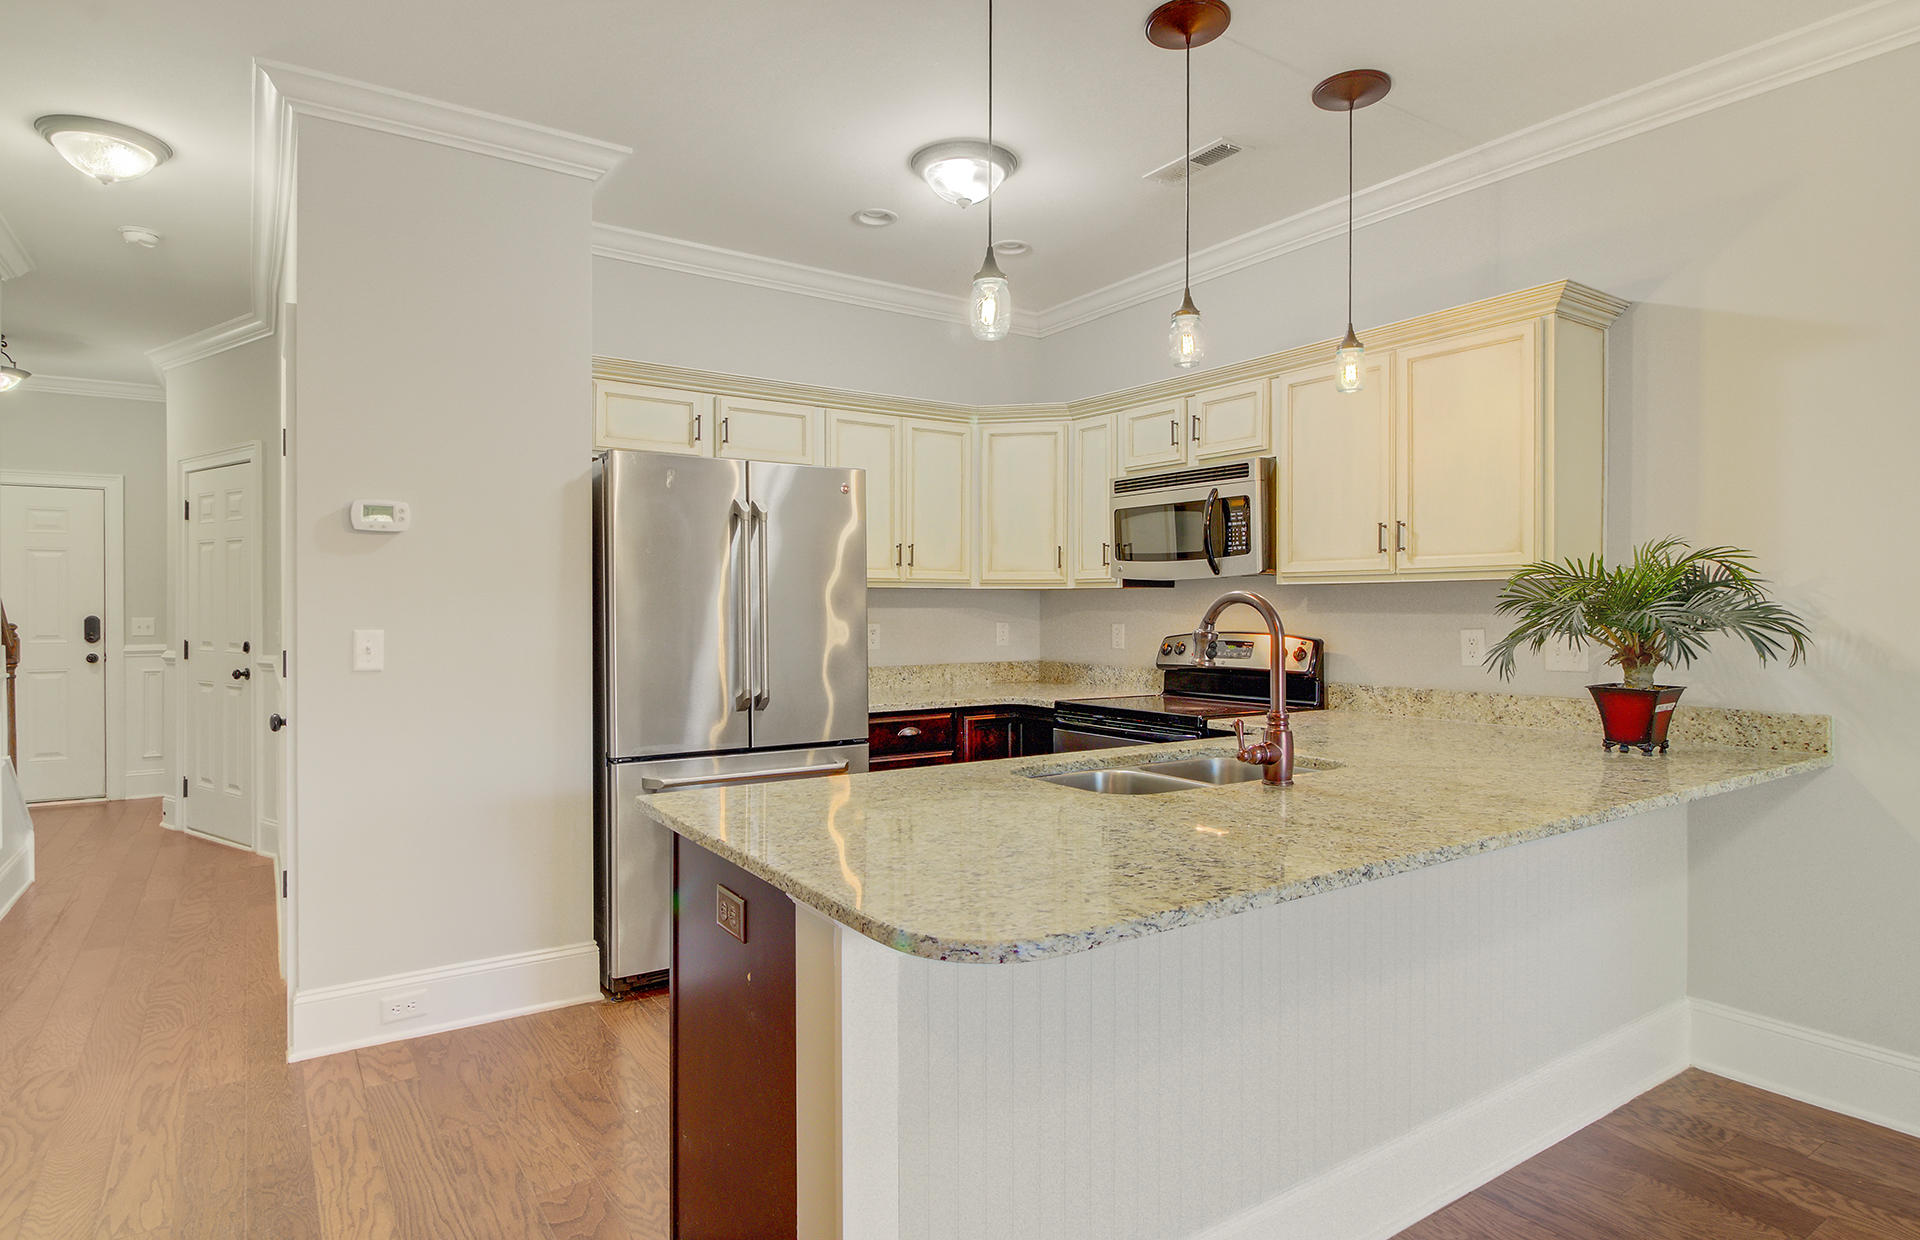 Carol Oaks Town Homes Homes For Sale - 2960 Emma, Mount Pleasant, SC - 3